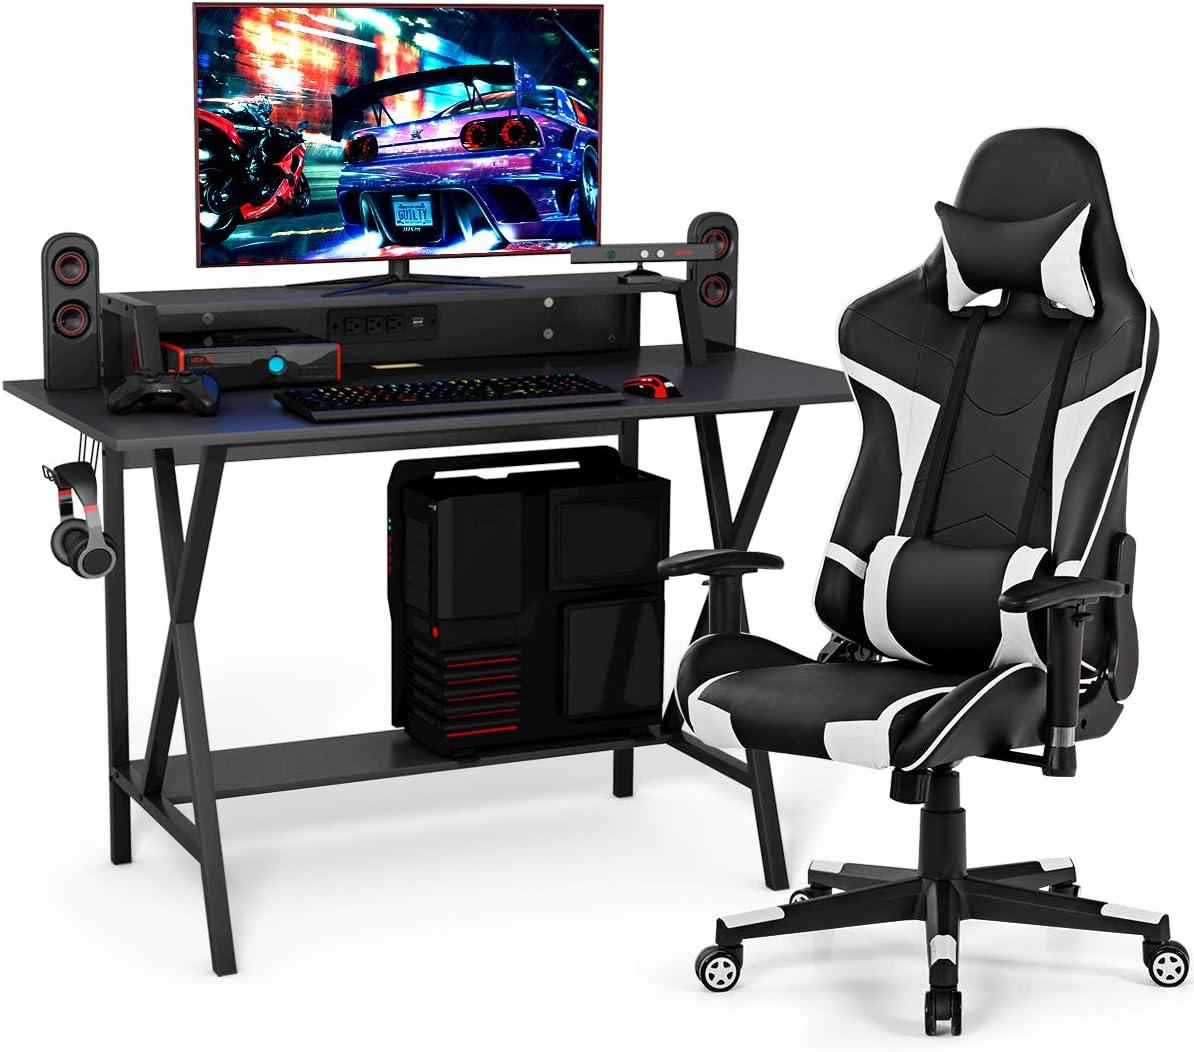 Tangkula Gaming Desk and Chair Set, Ergonomic E-Sport Gamer Desk & Racing Chair Set w/Cup Holder, Monitor Stand, Earphone Hook, Massage & Headrest, Home Office Computer Desk Chair Set (White)